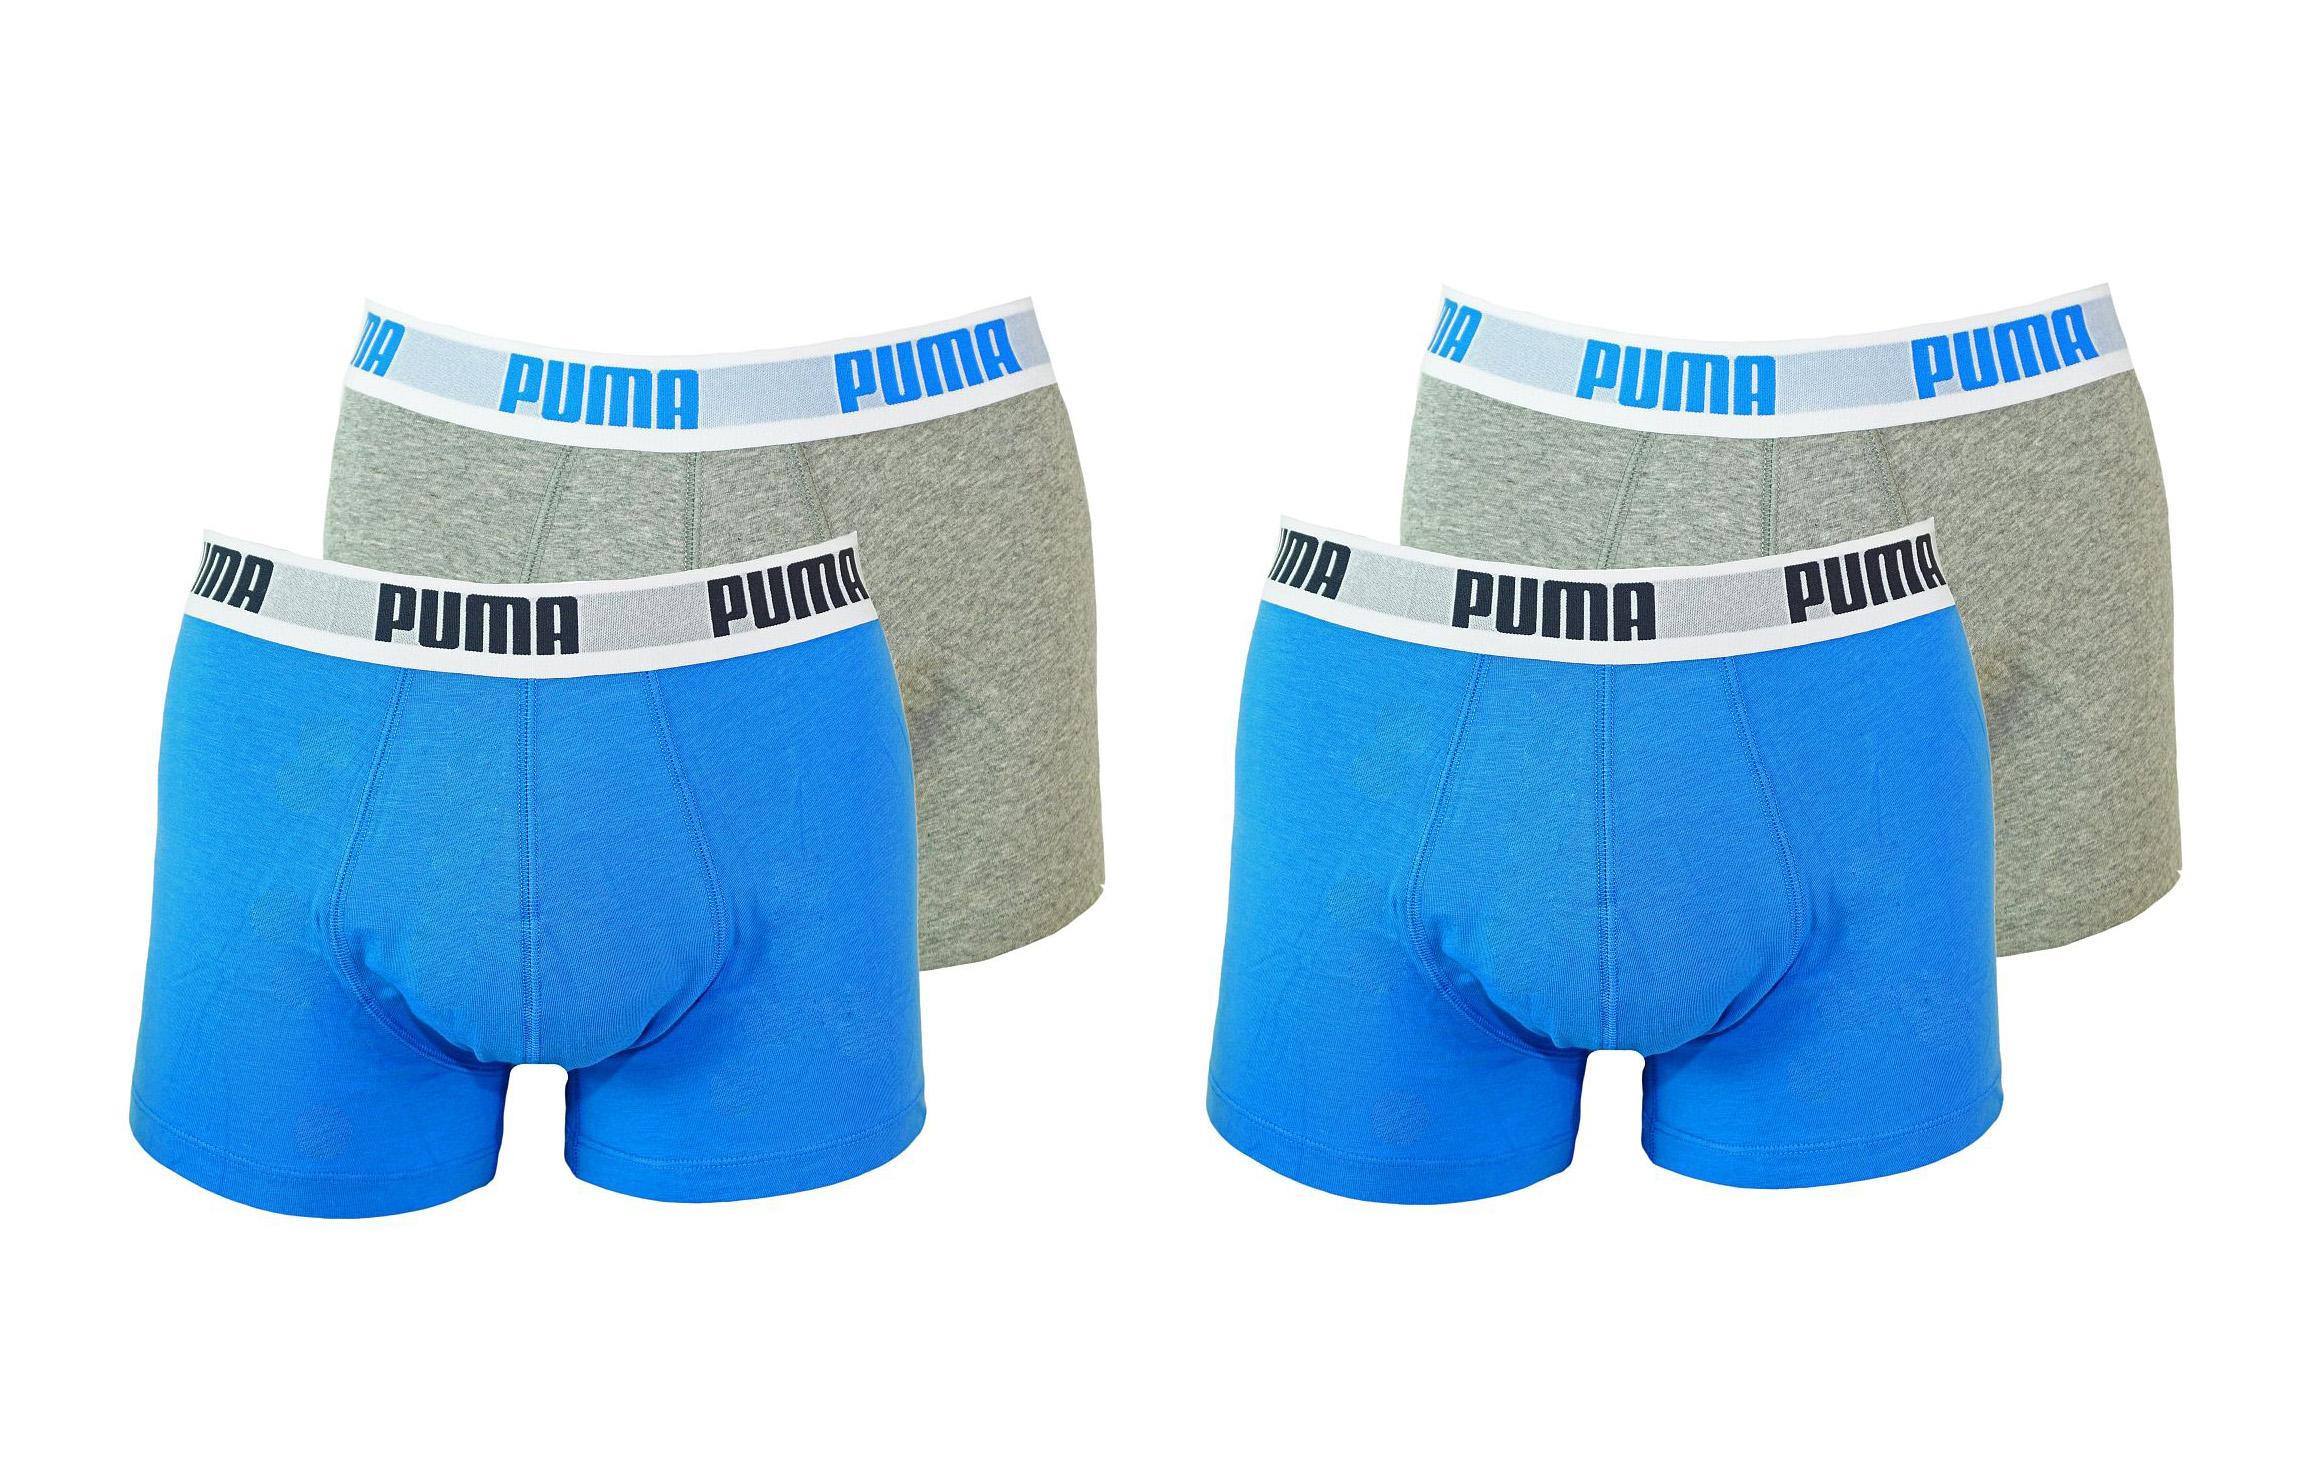 PUMA Shorts Unterhosen 2 x 2er Pack Trunk 521025001 417 020 blue, grey SF17-PMS2